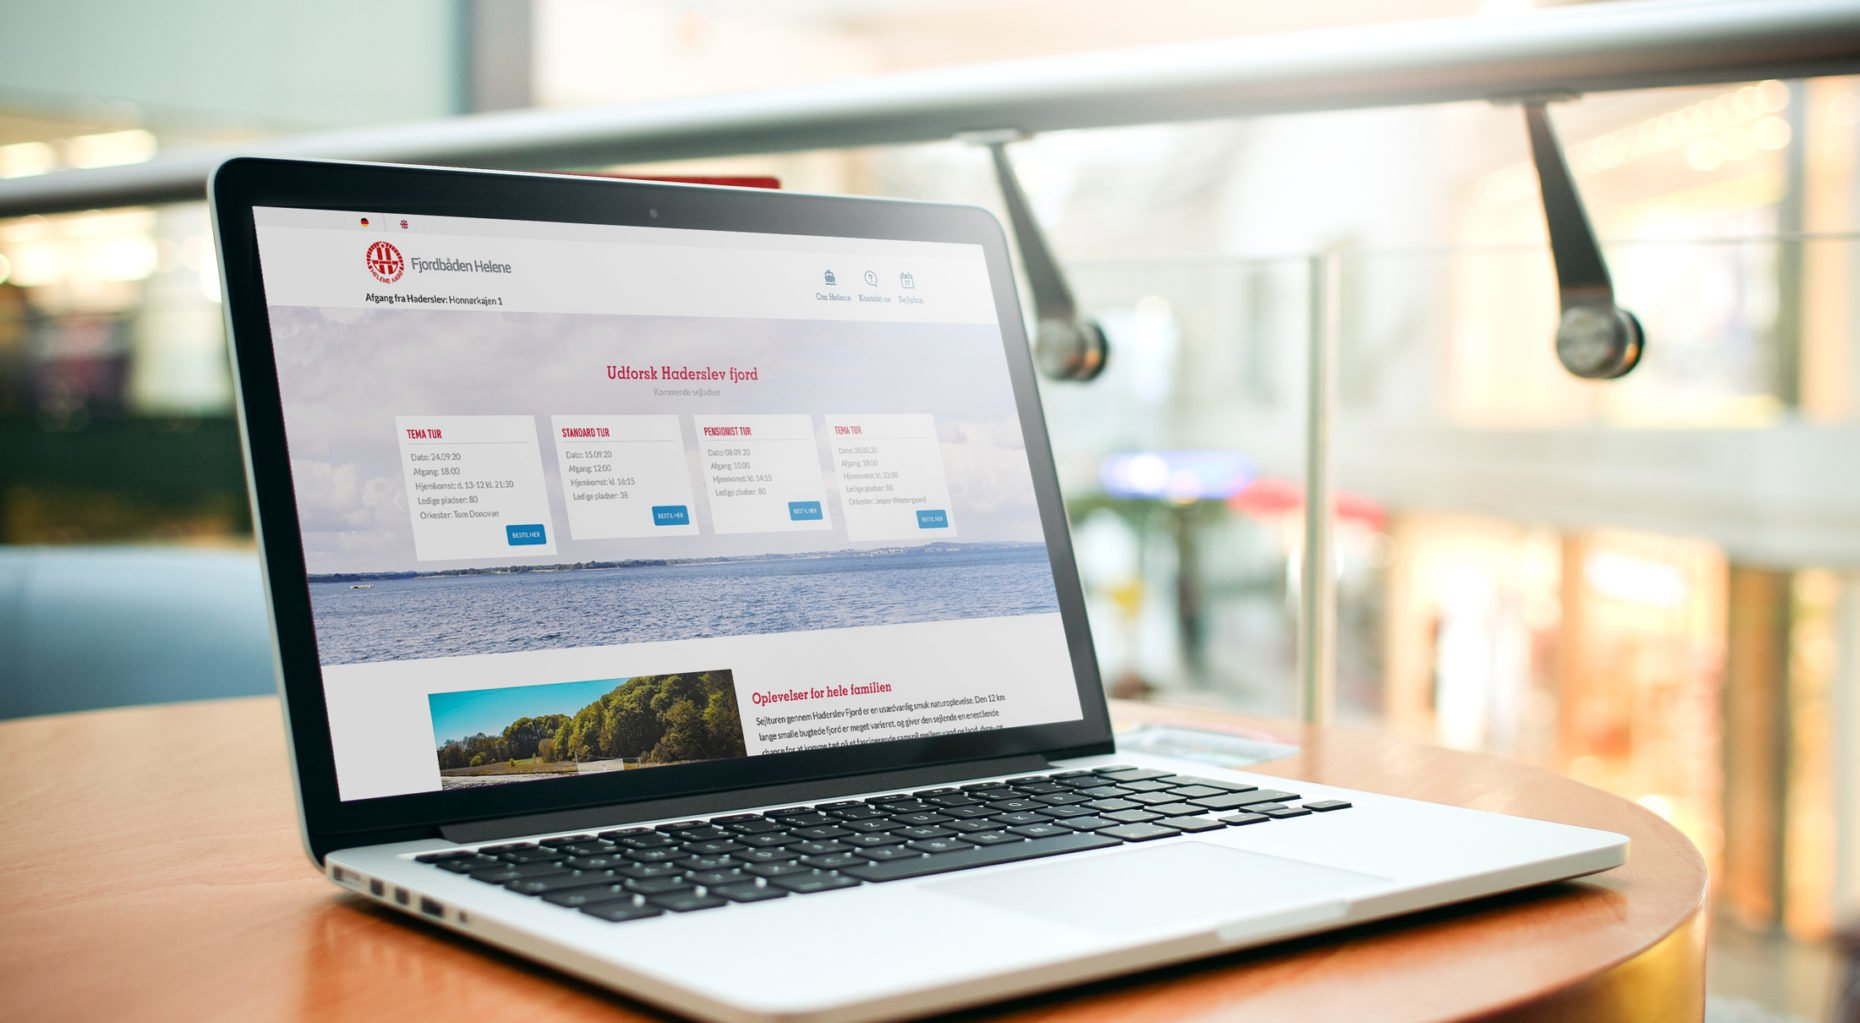 Wordpress udvikling LENNART C - fjordbaaden.dk case